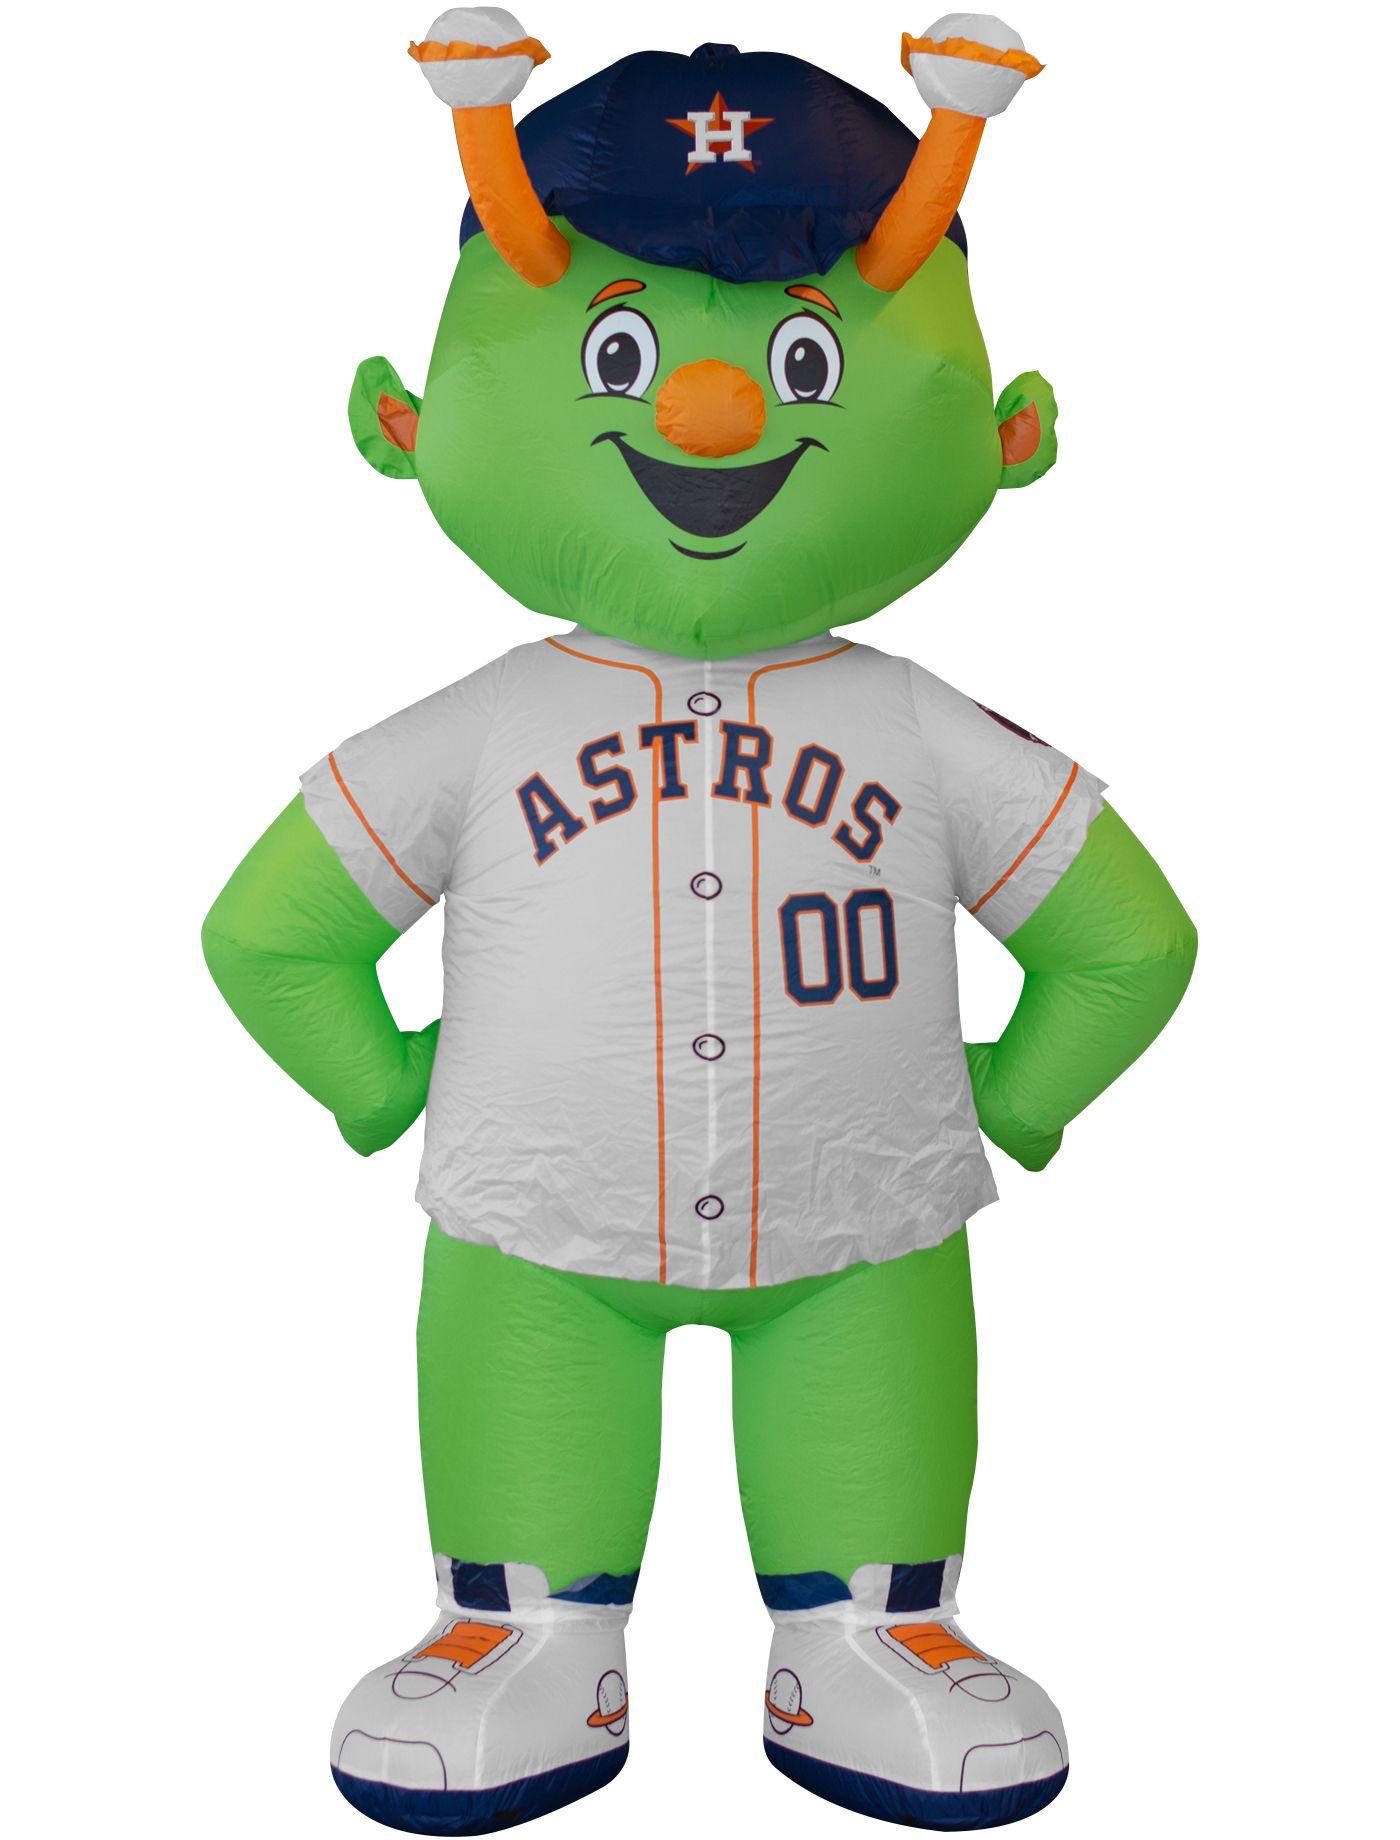 Boelter Houston Astros Inflatable Mascot